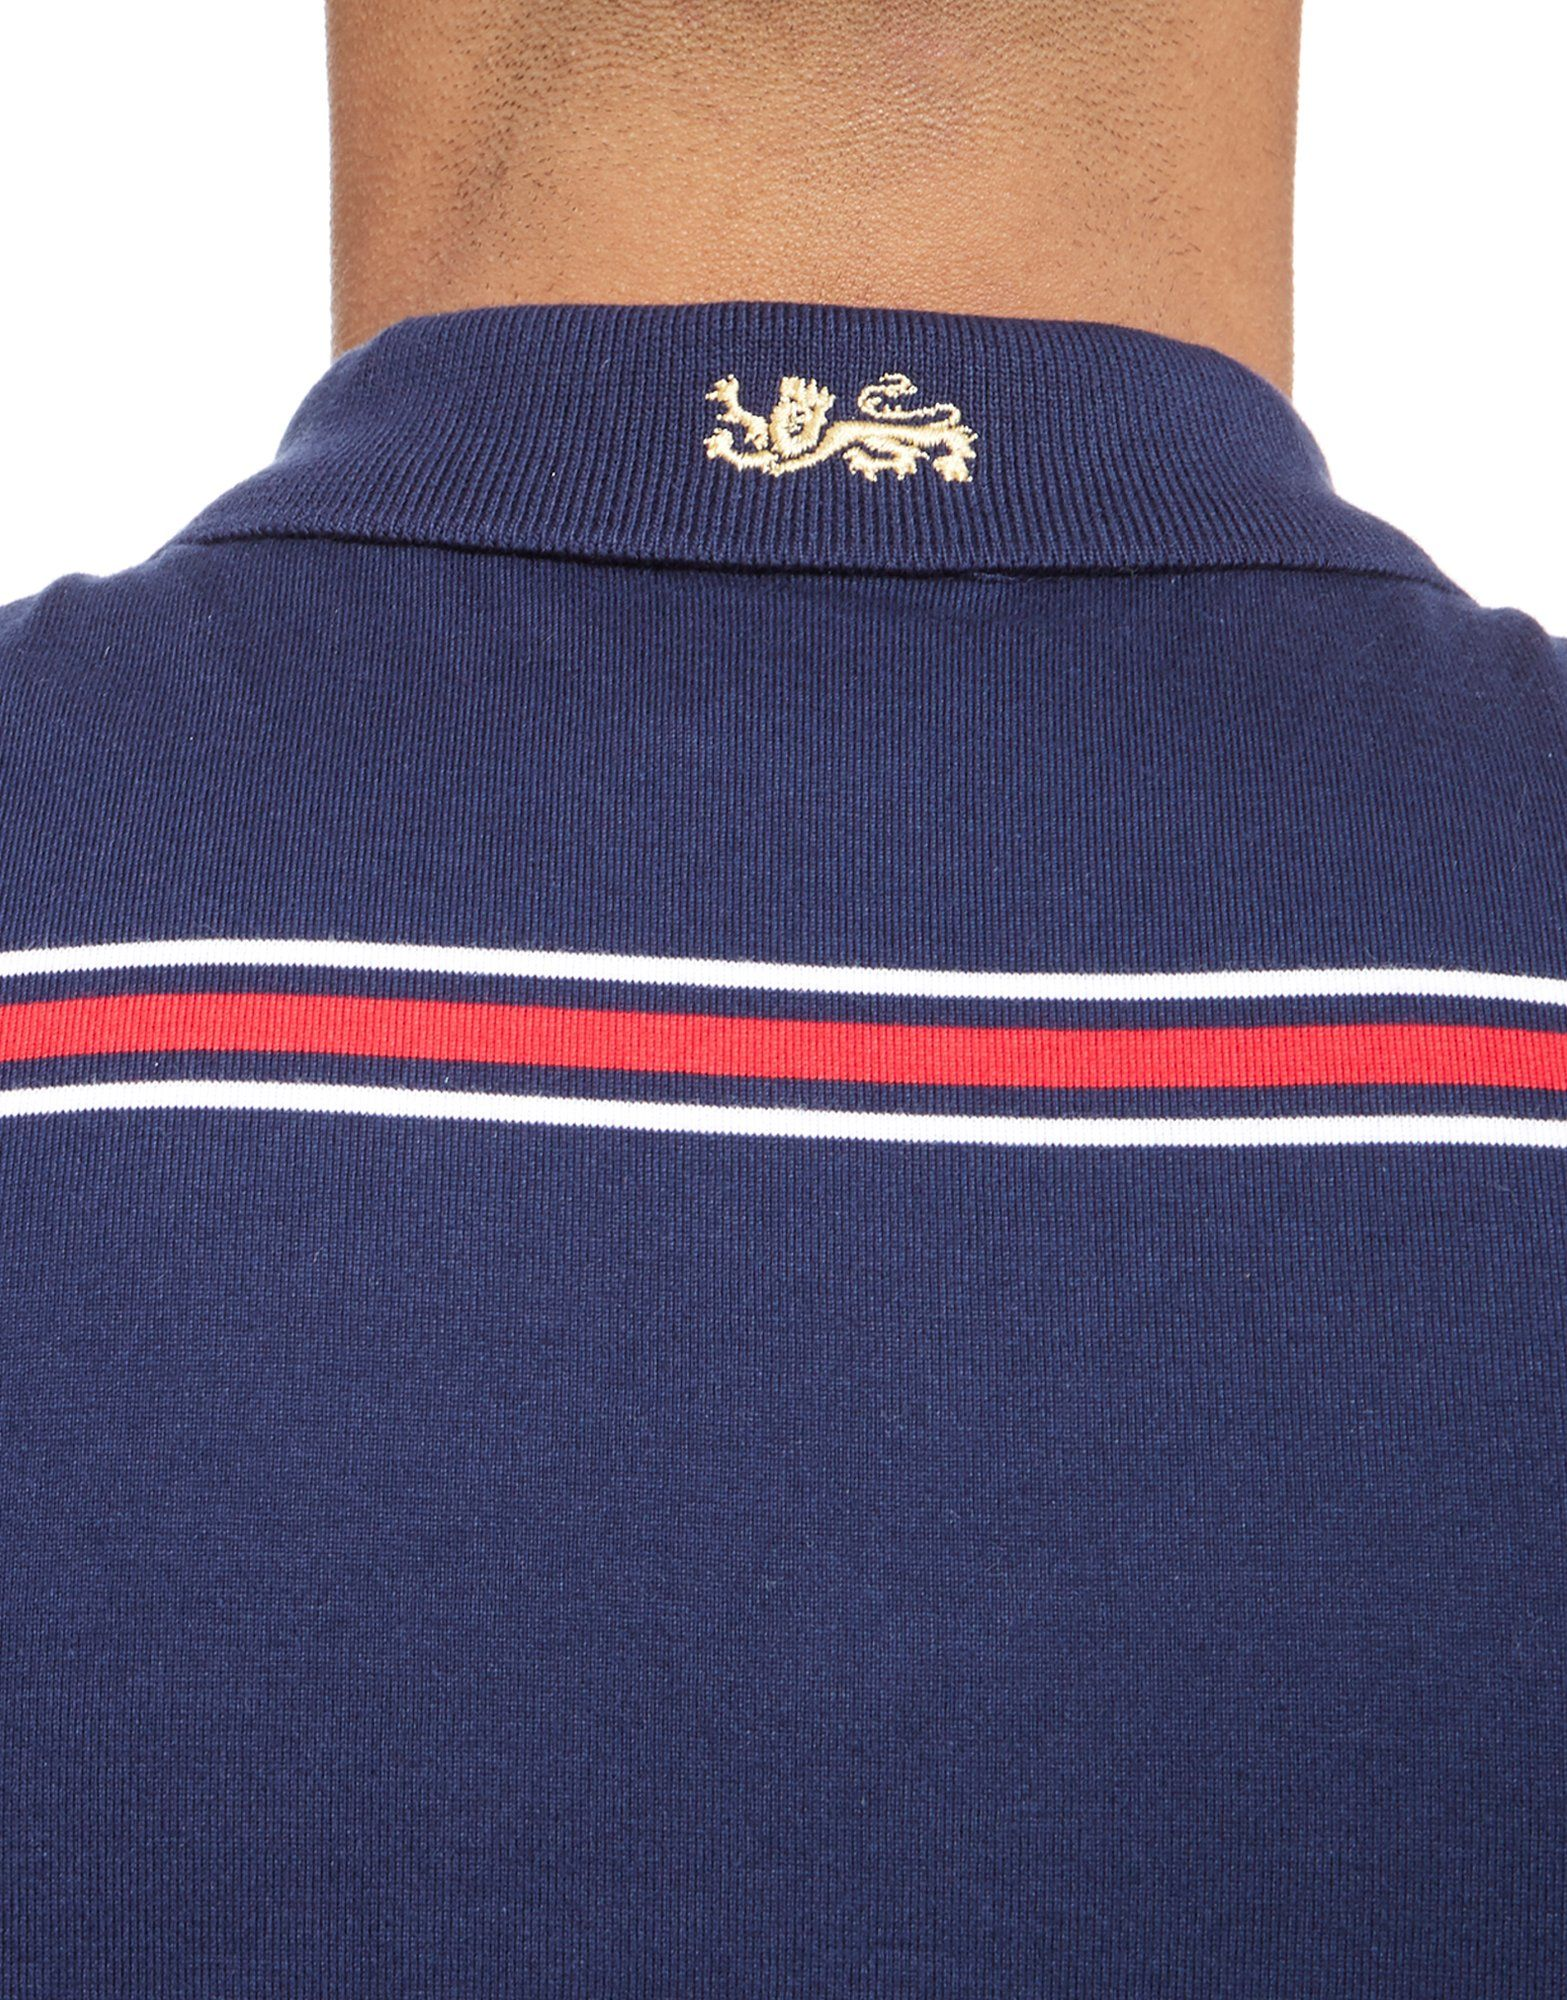 Canterbury British & Irish Lions 2017 Strip Polo Shirt